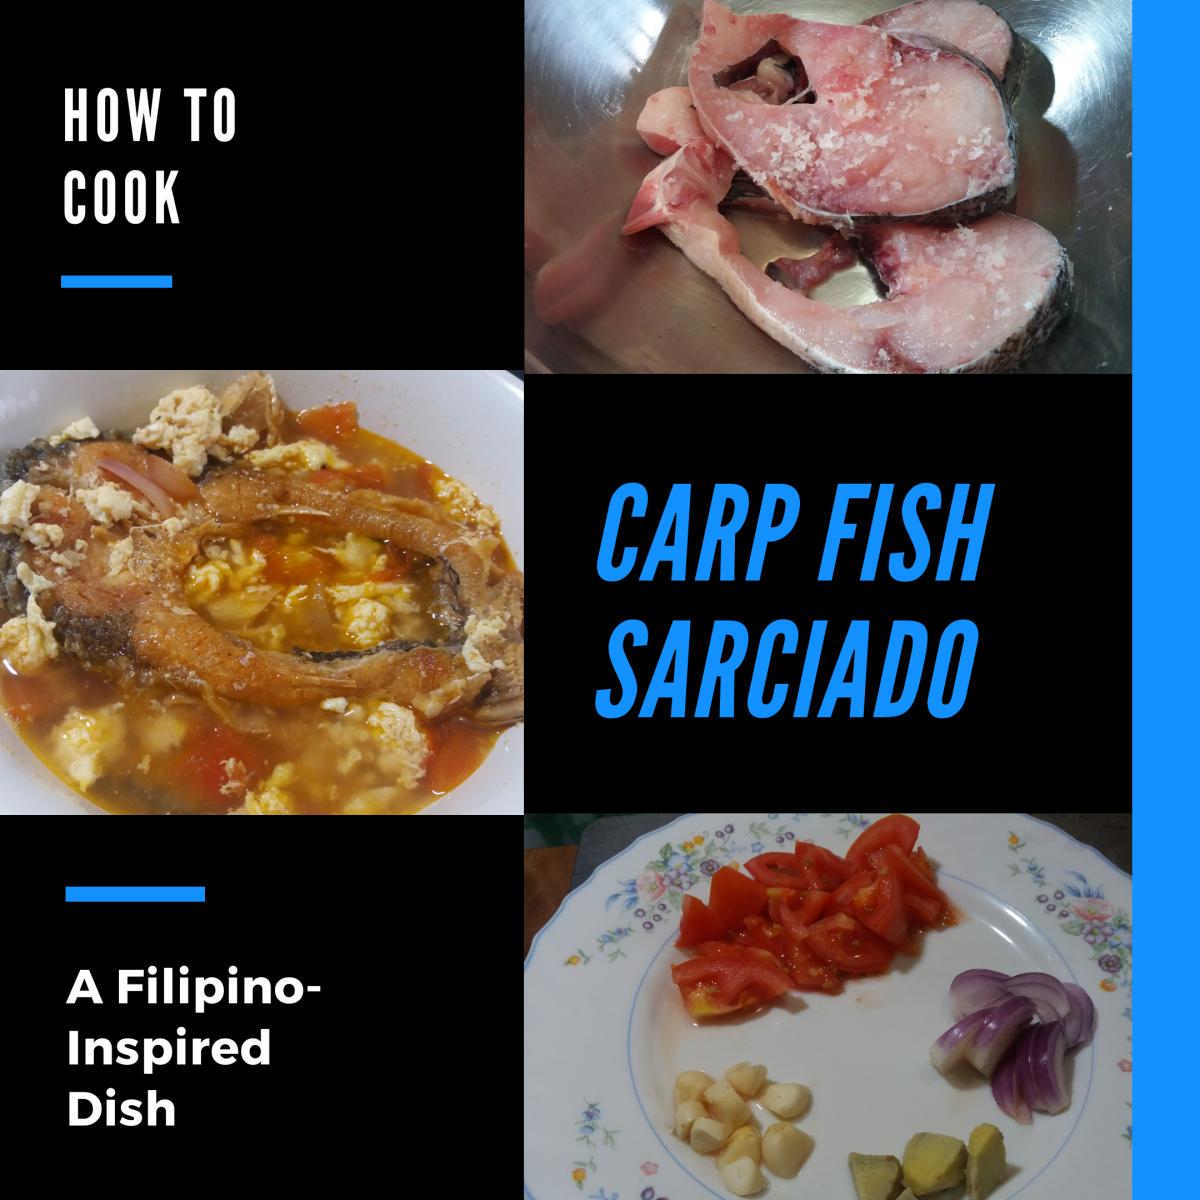 How to Cook Carp Fish Sarciado: A Filipino-Inspired Dish